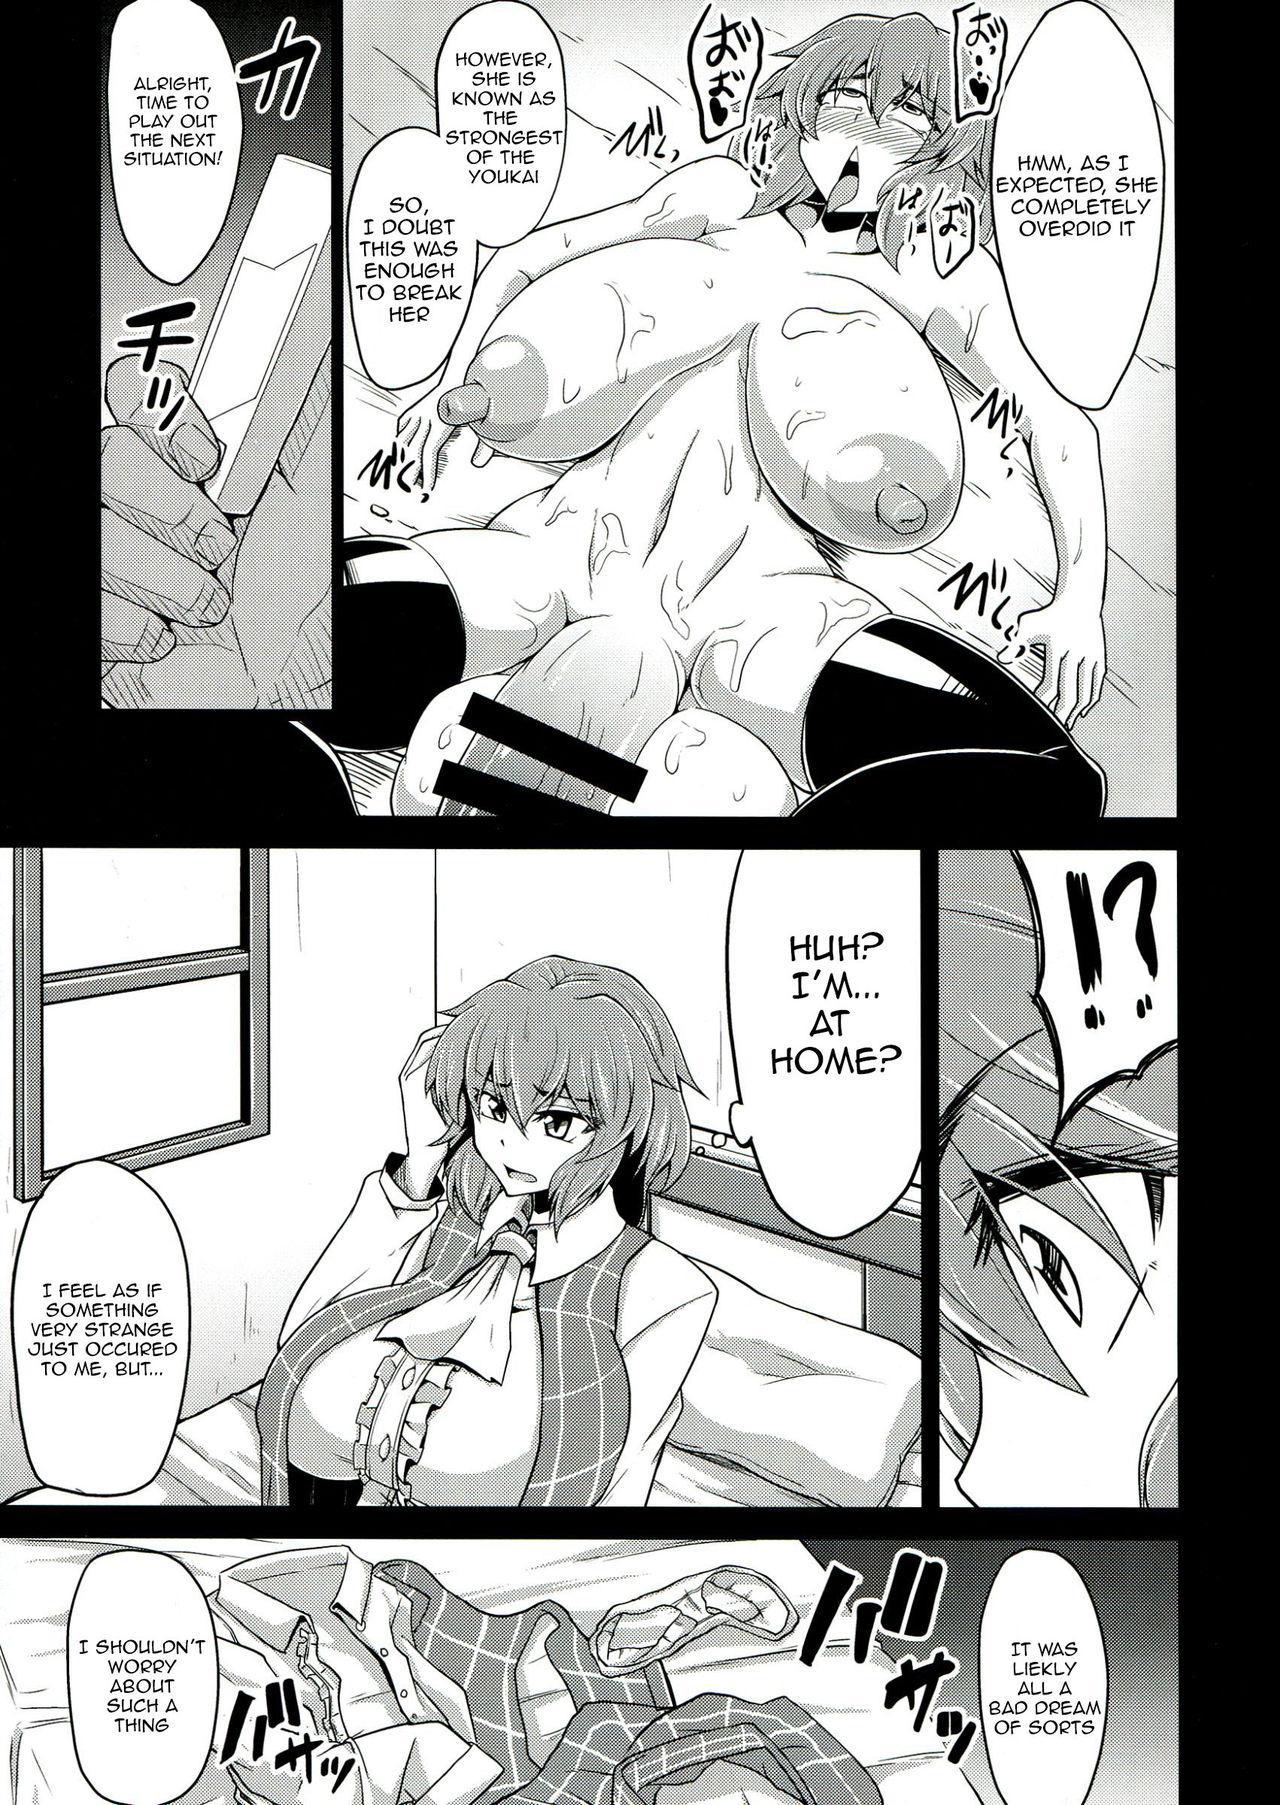 Gensou Saichin Monogatari 12